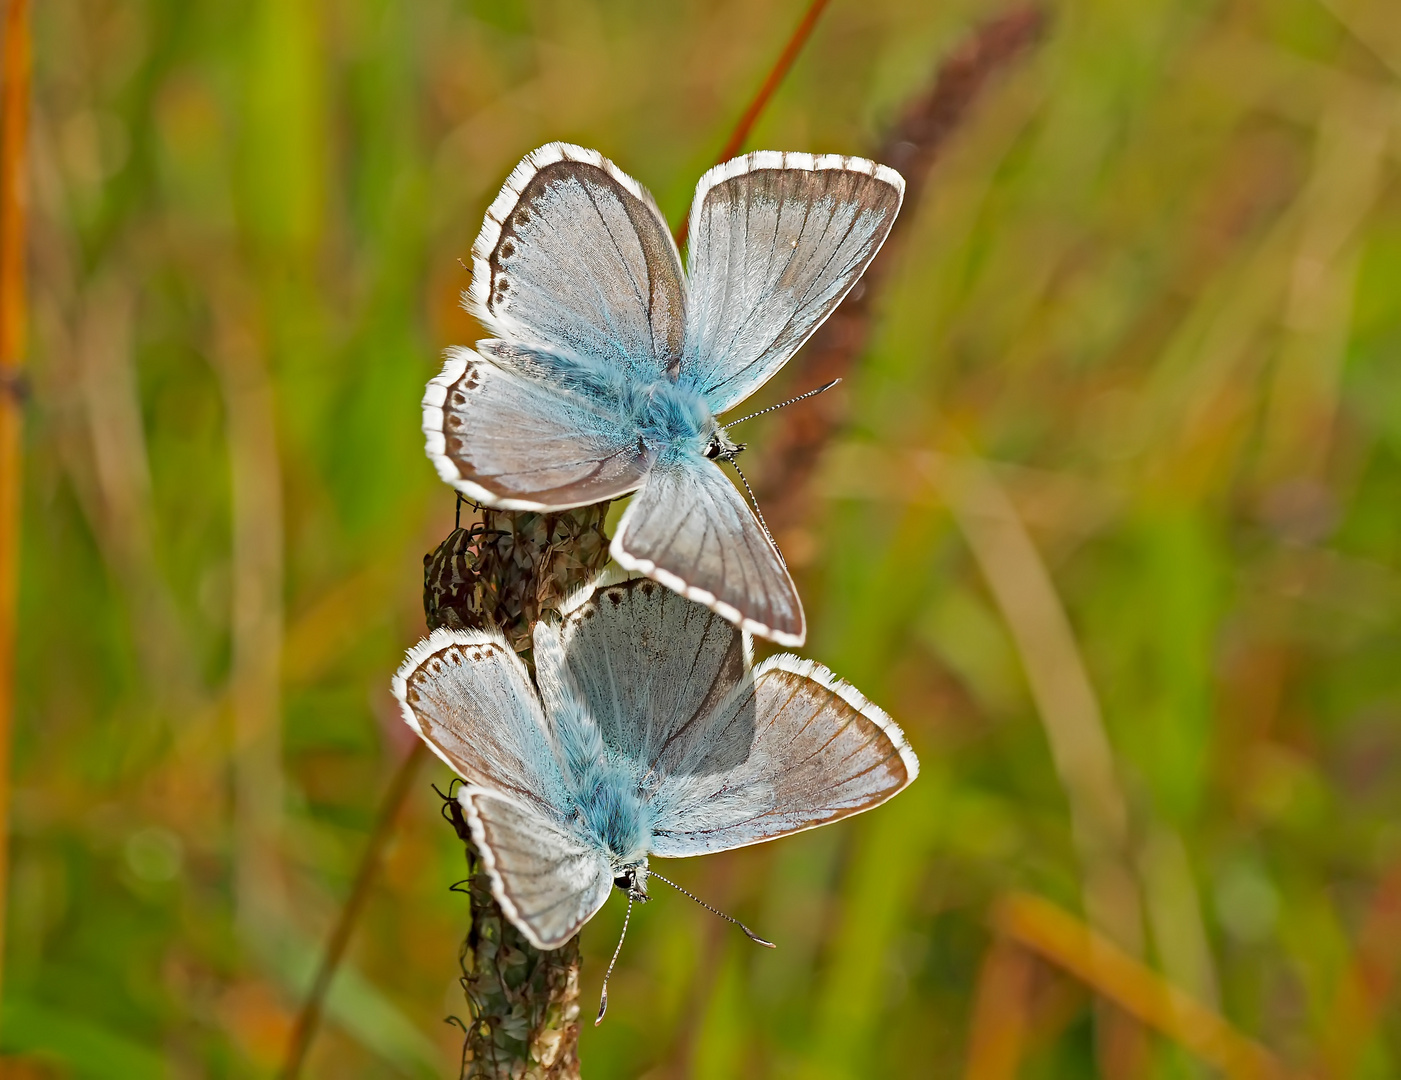 Silbergrüner Bläuling (Polyommatus coridon bzw. Lysandra coridon) - L'Argus bleu-nacré.